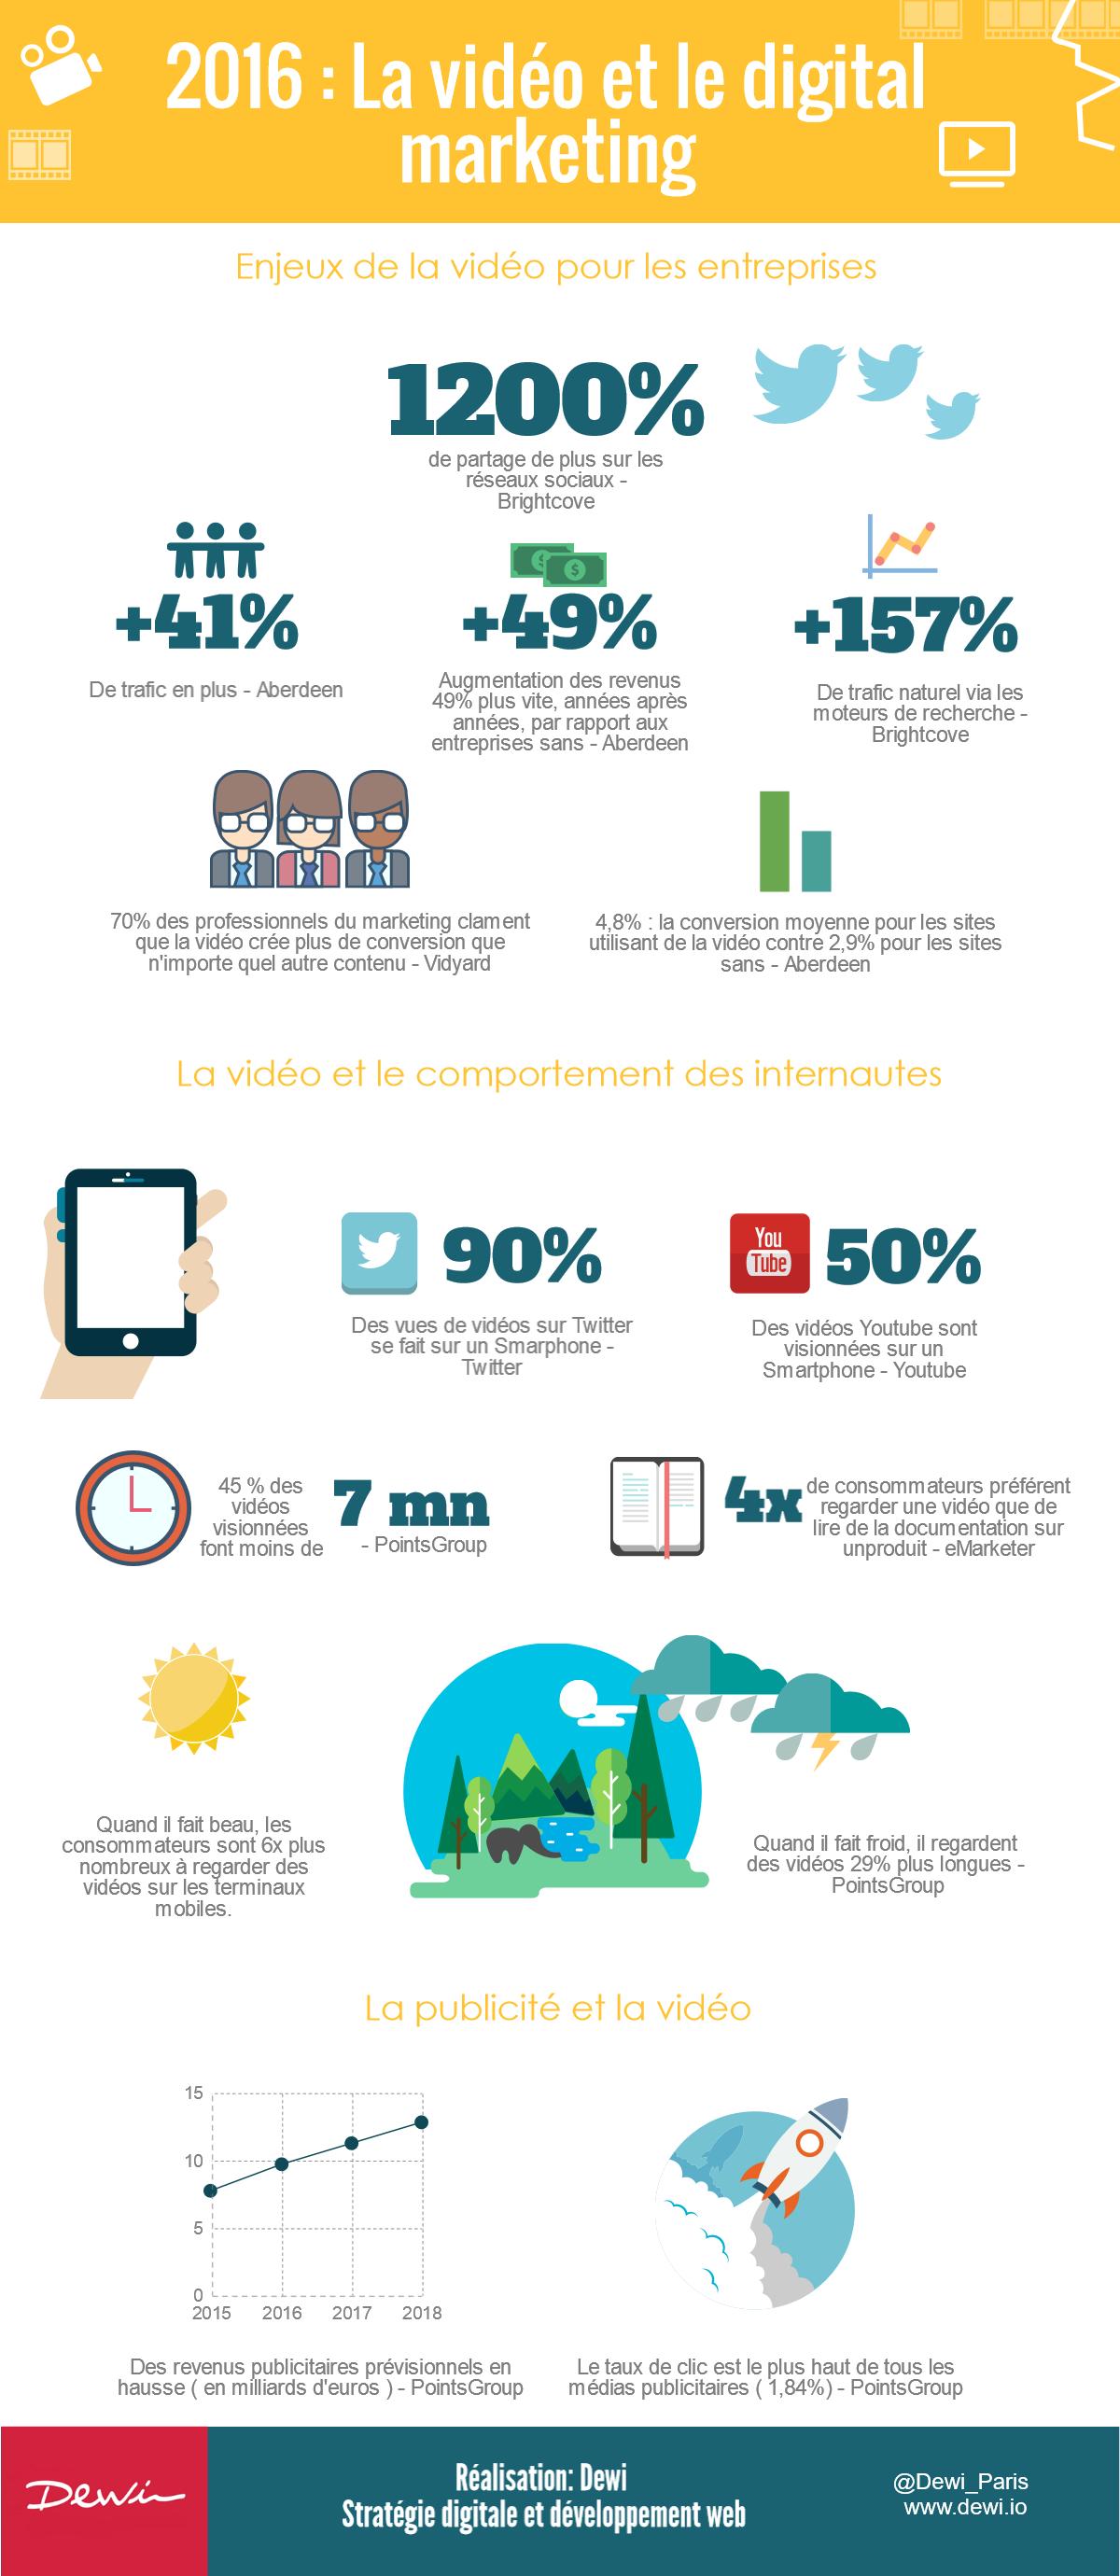 infographie - video et social marketing #infographie #video #digitalmarketing